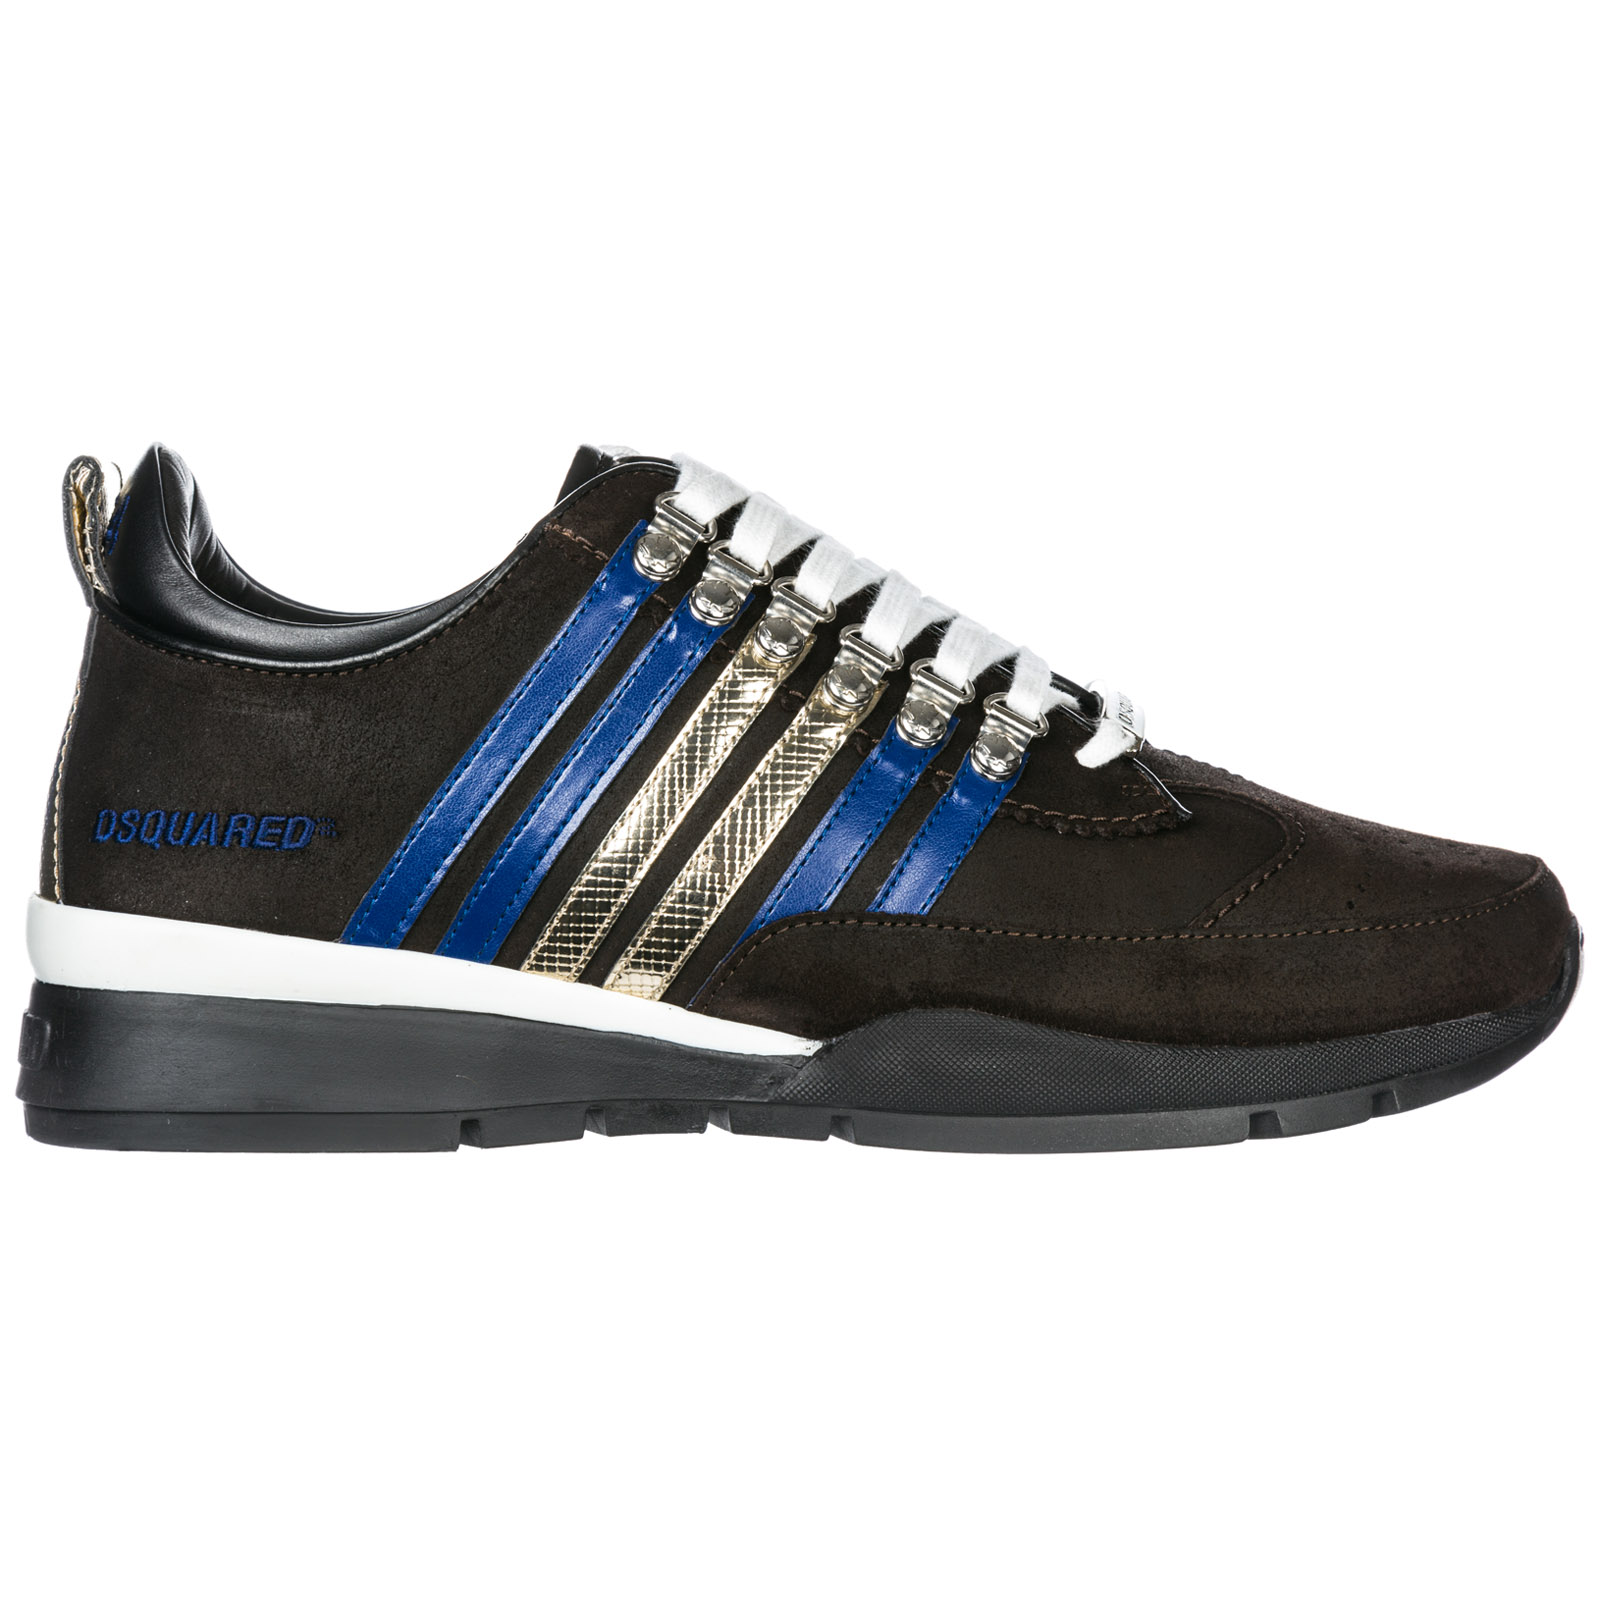 Sneakers Dsquared2 251 SNM010129601211M1276 testa di moro - blu ... 83c821cd304